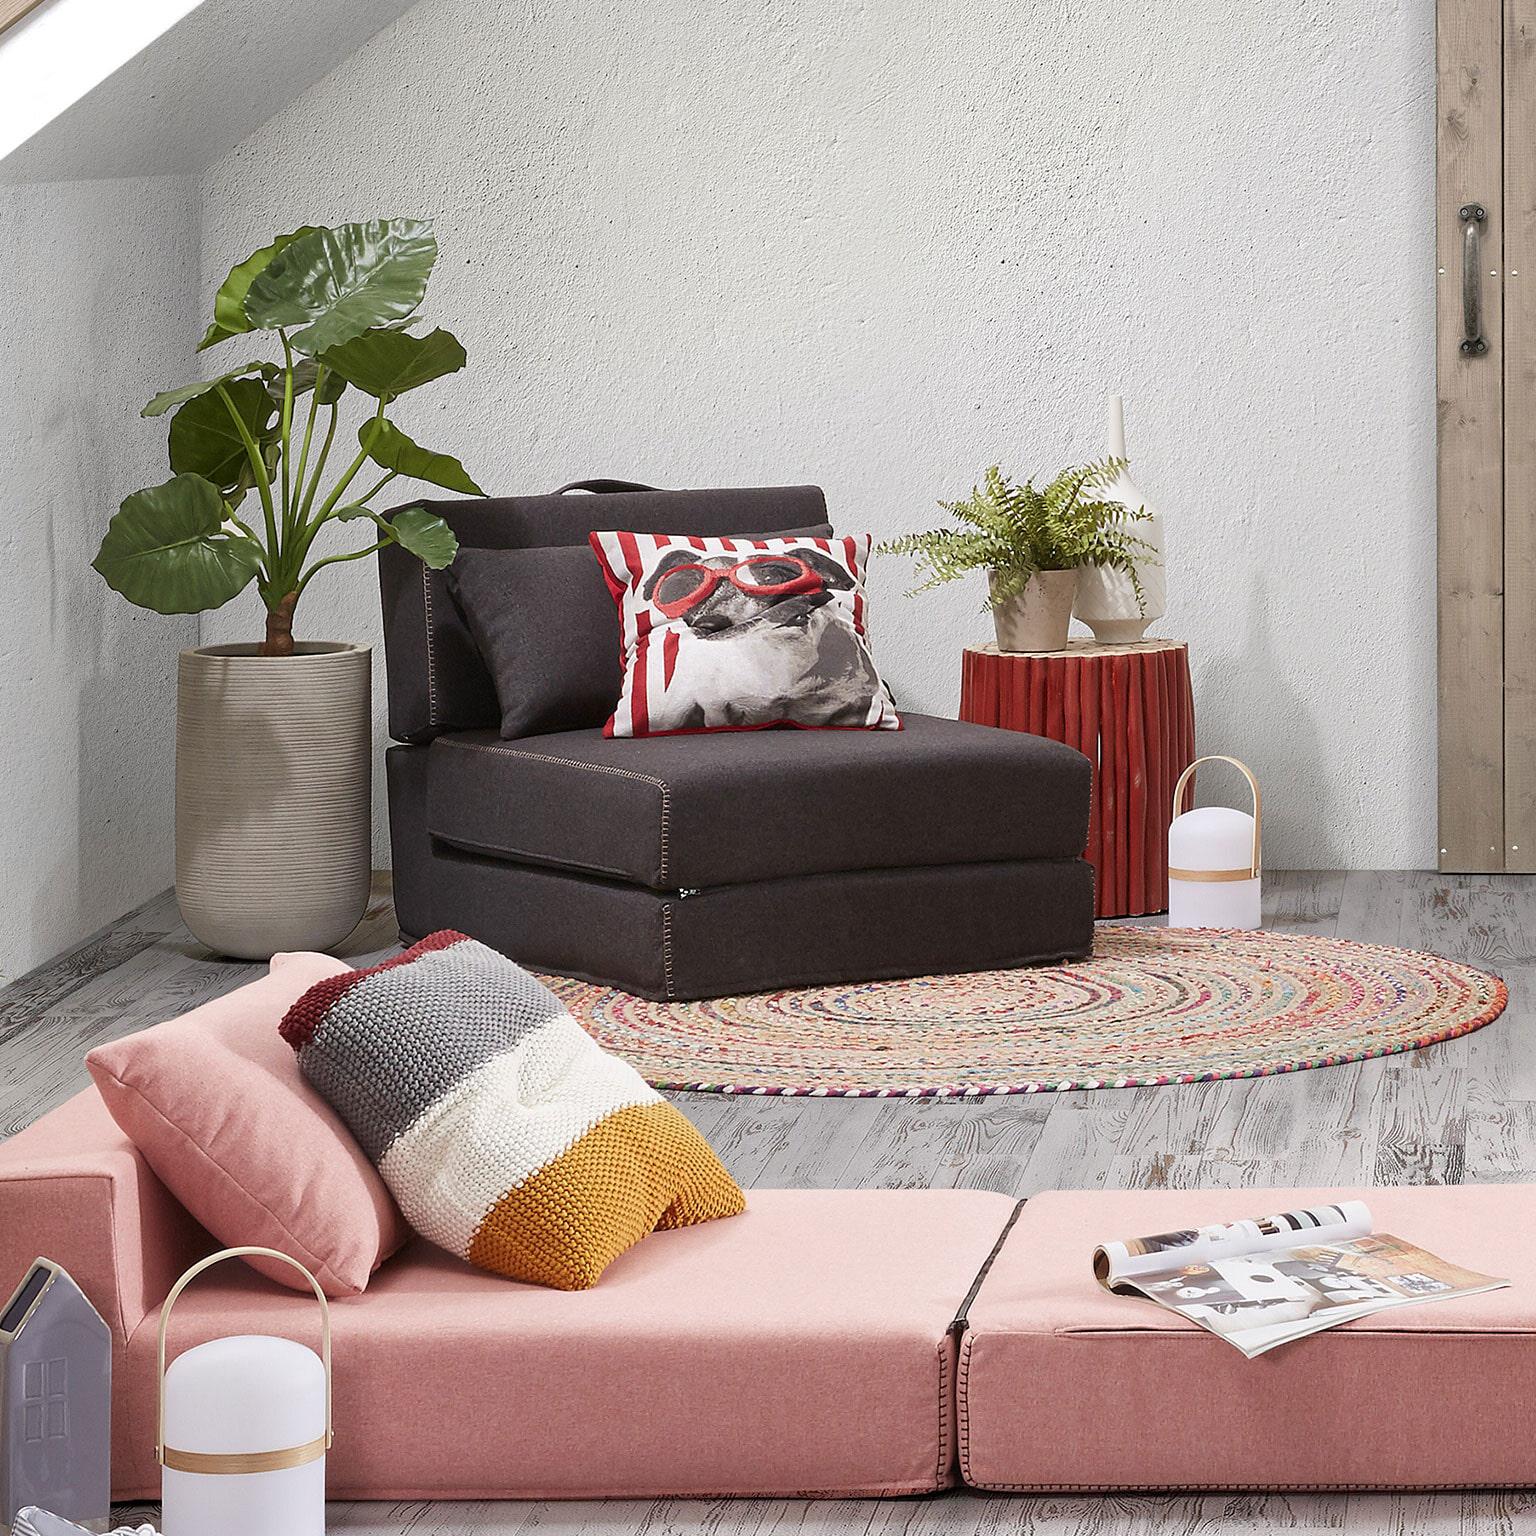 Kave Home Vouwbed Arty kleur antraciet